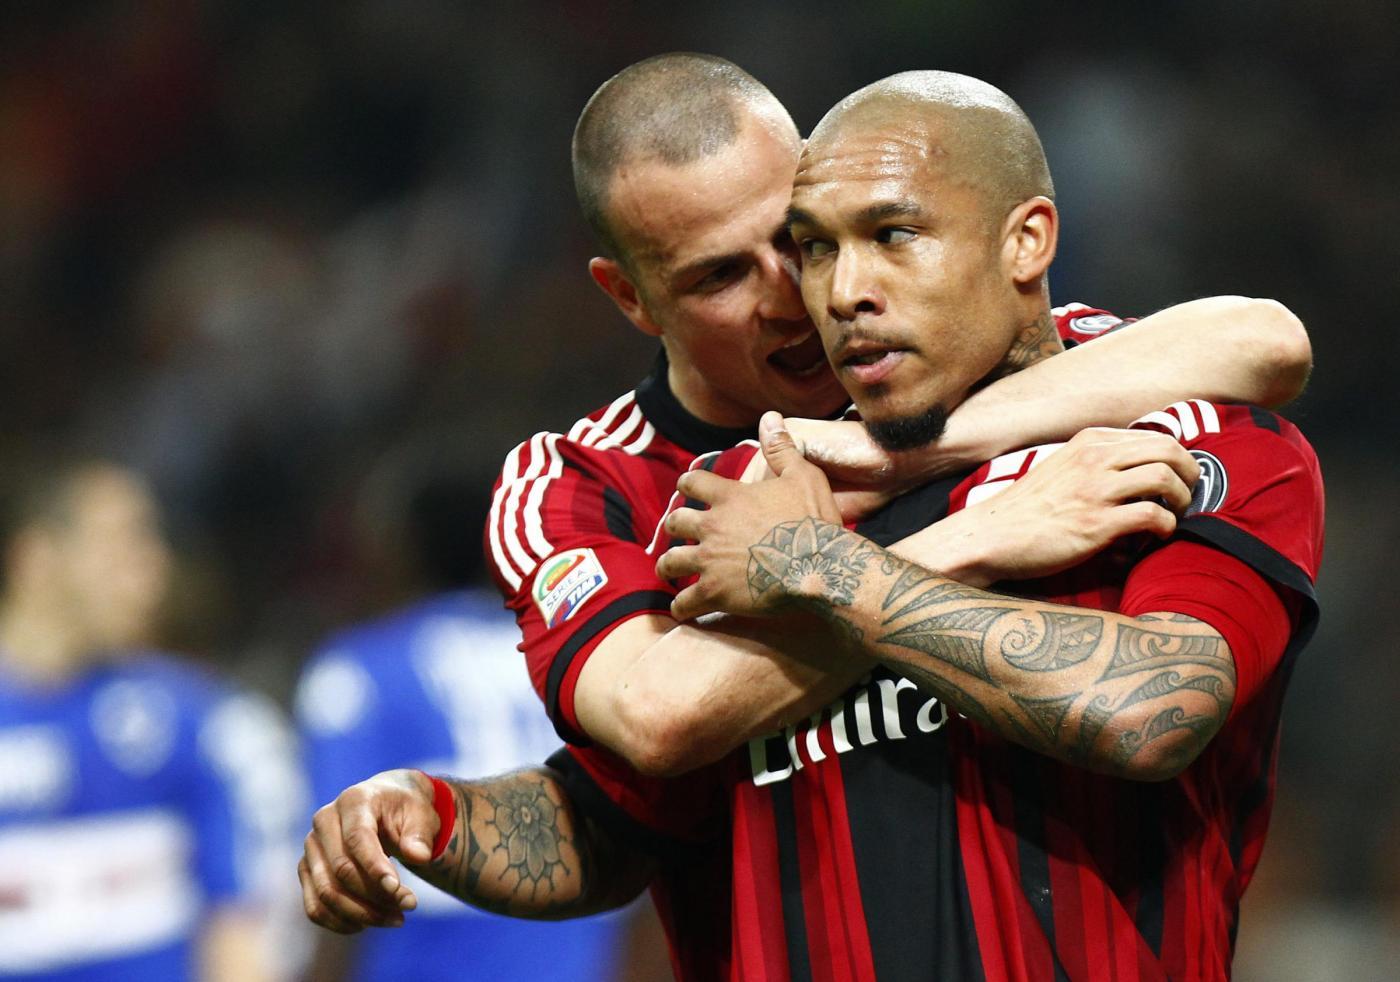 Milan vs Sampdoria 1-1: un pareggio poco utile per entrambe